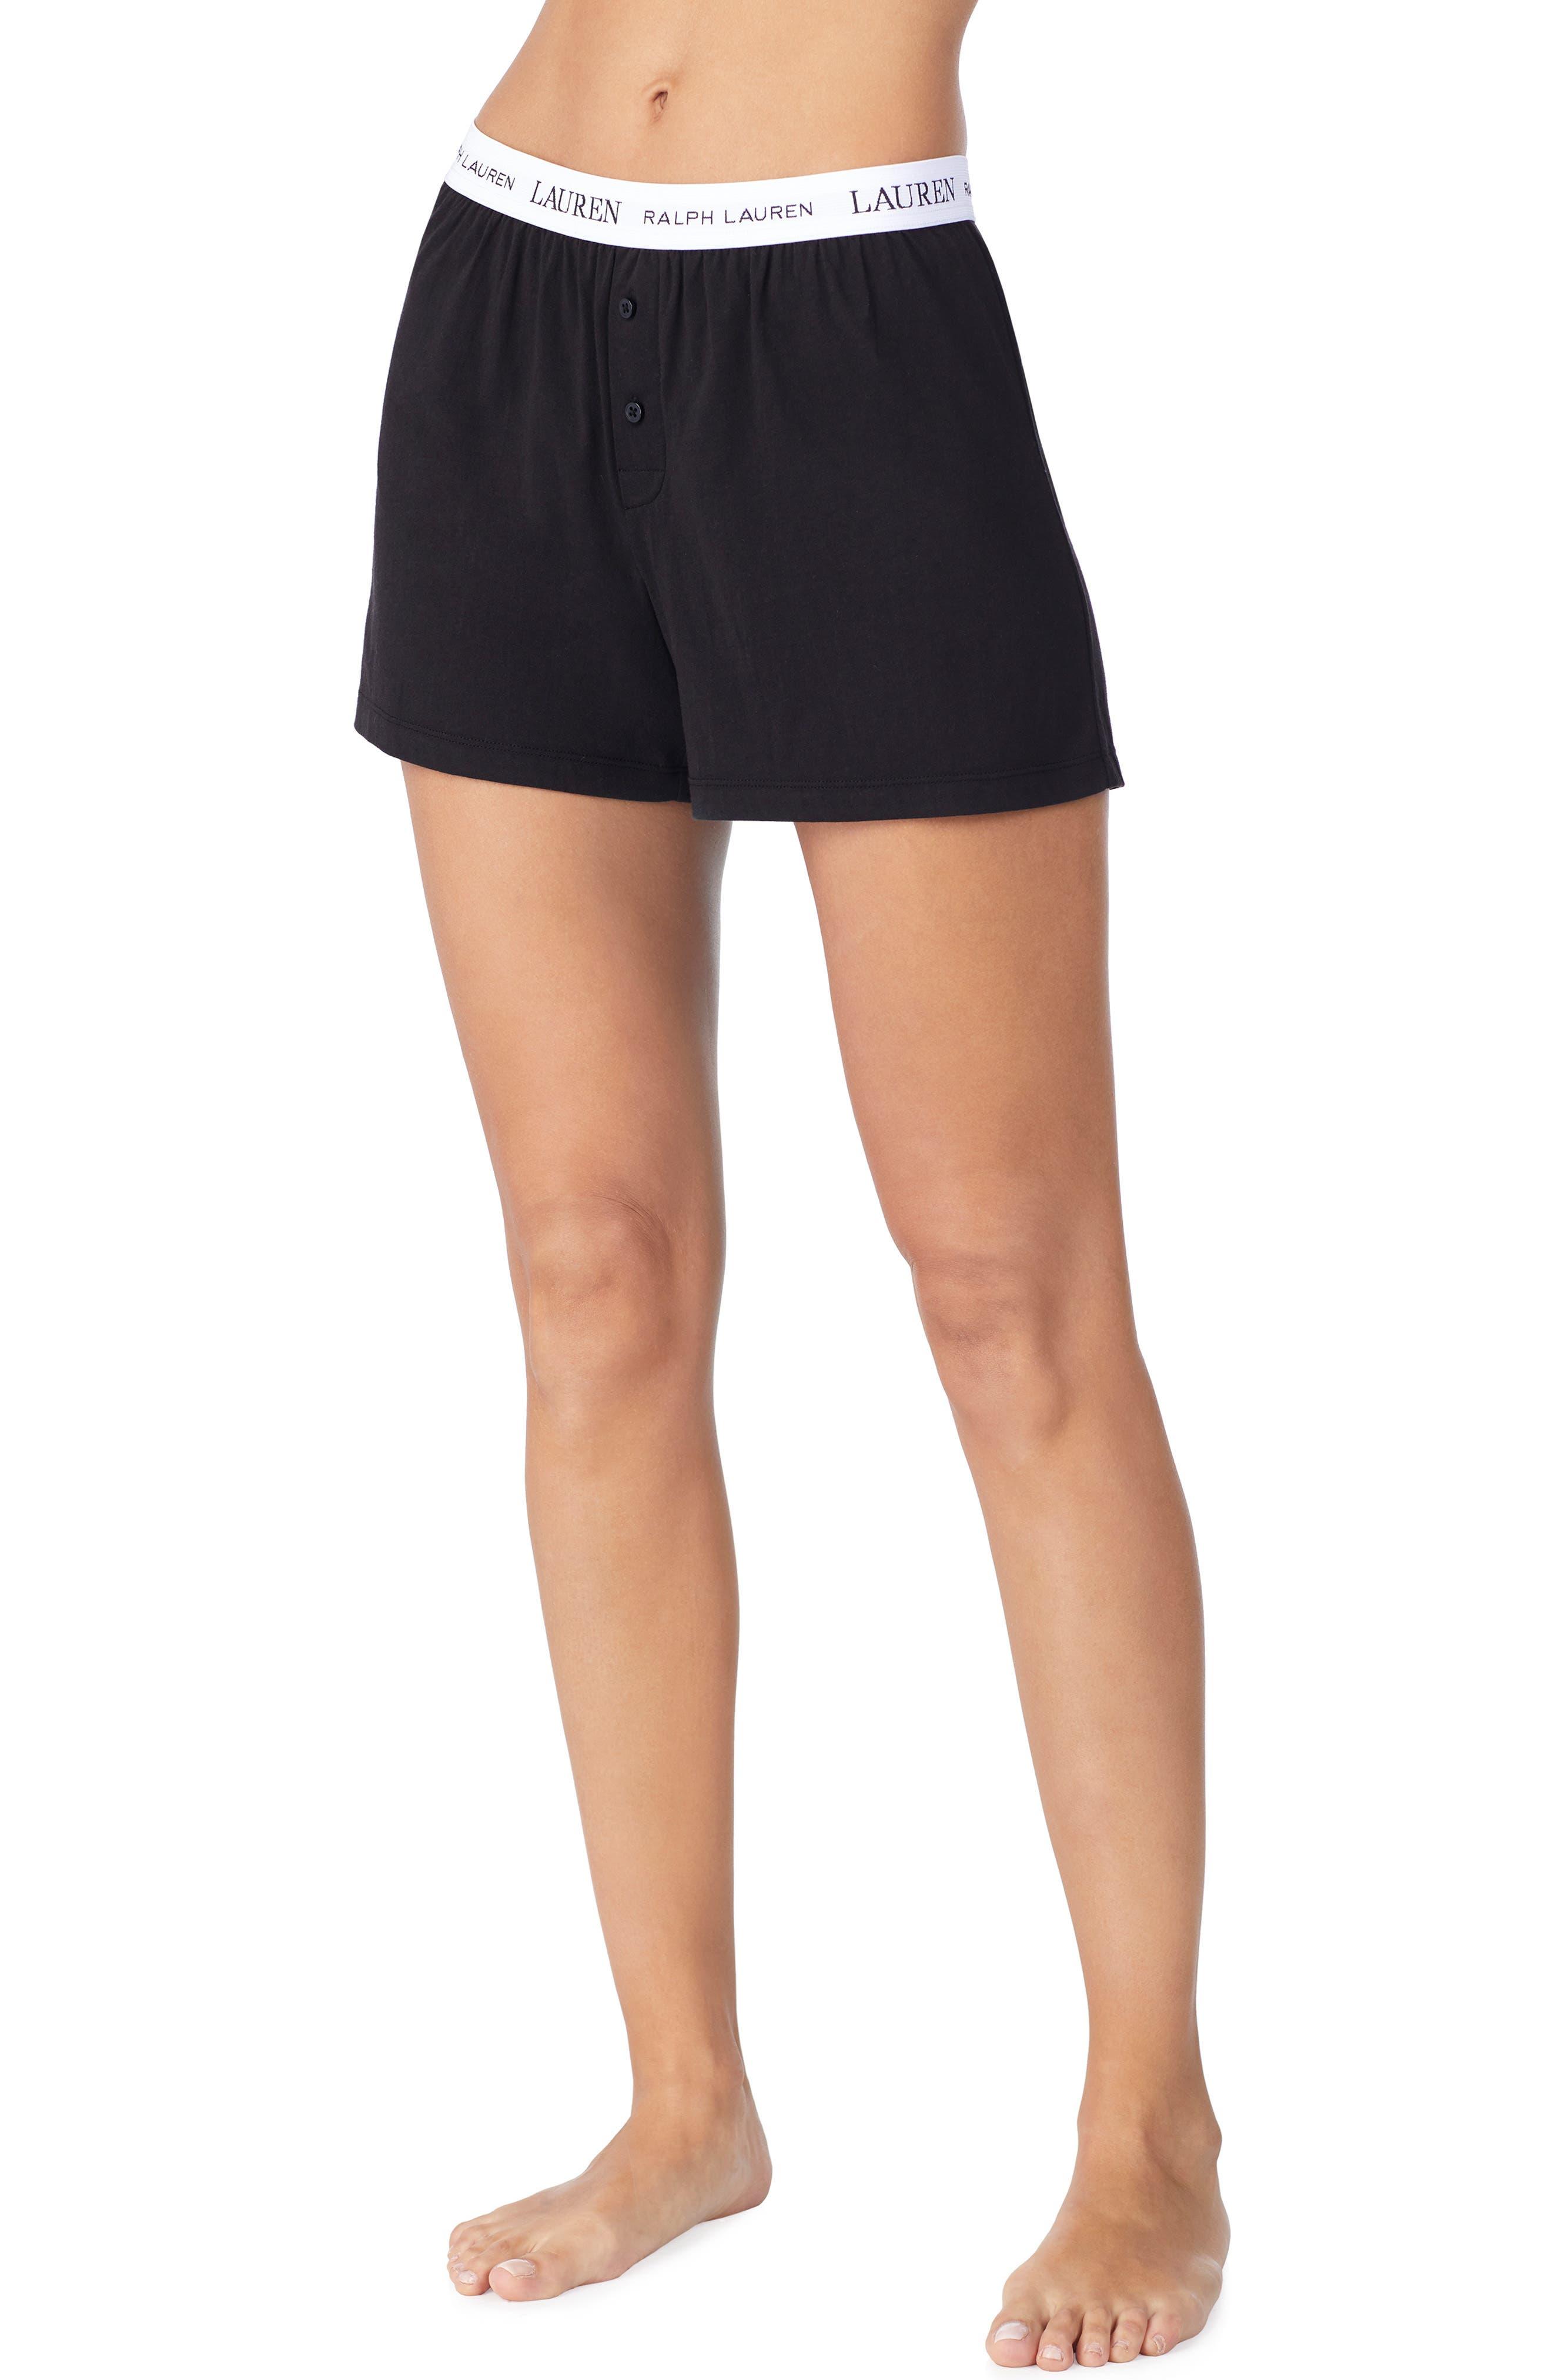 LAUREN RALPH LAUREN Logo Elastic Boxer Lounge Shorts, Main, color, BLACK